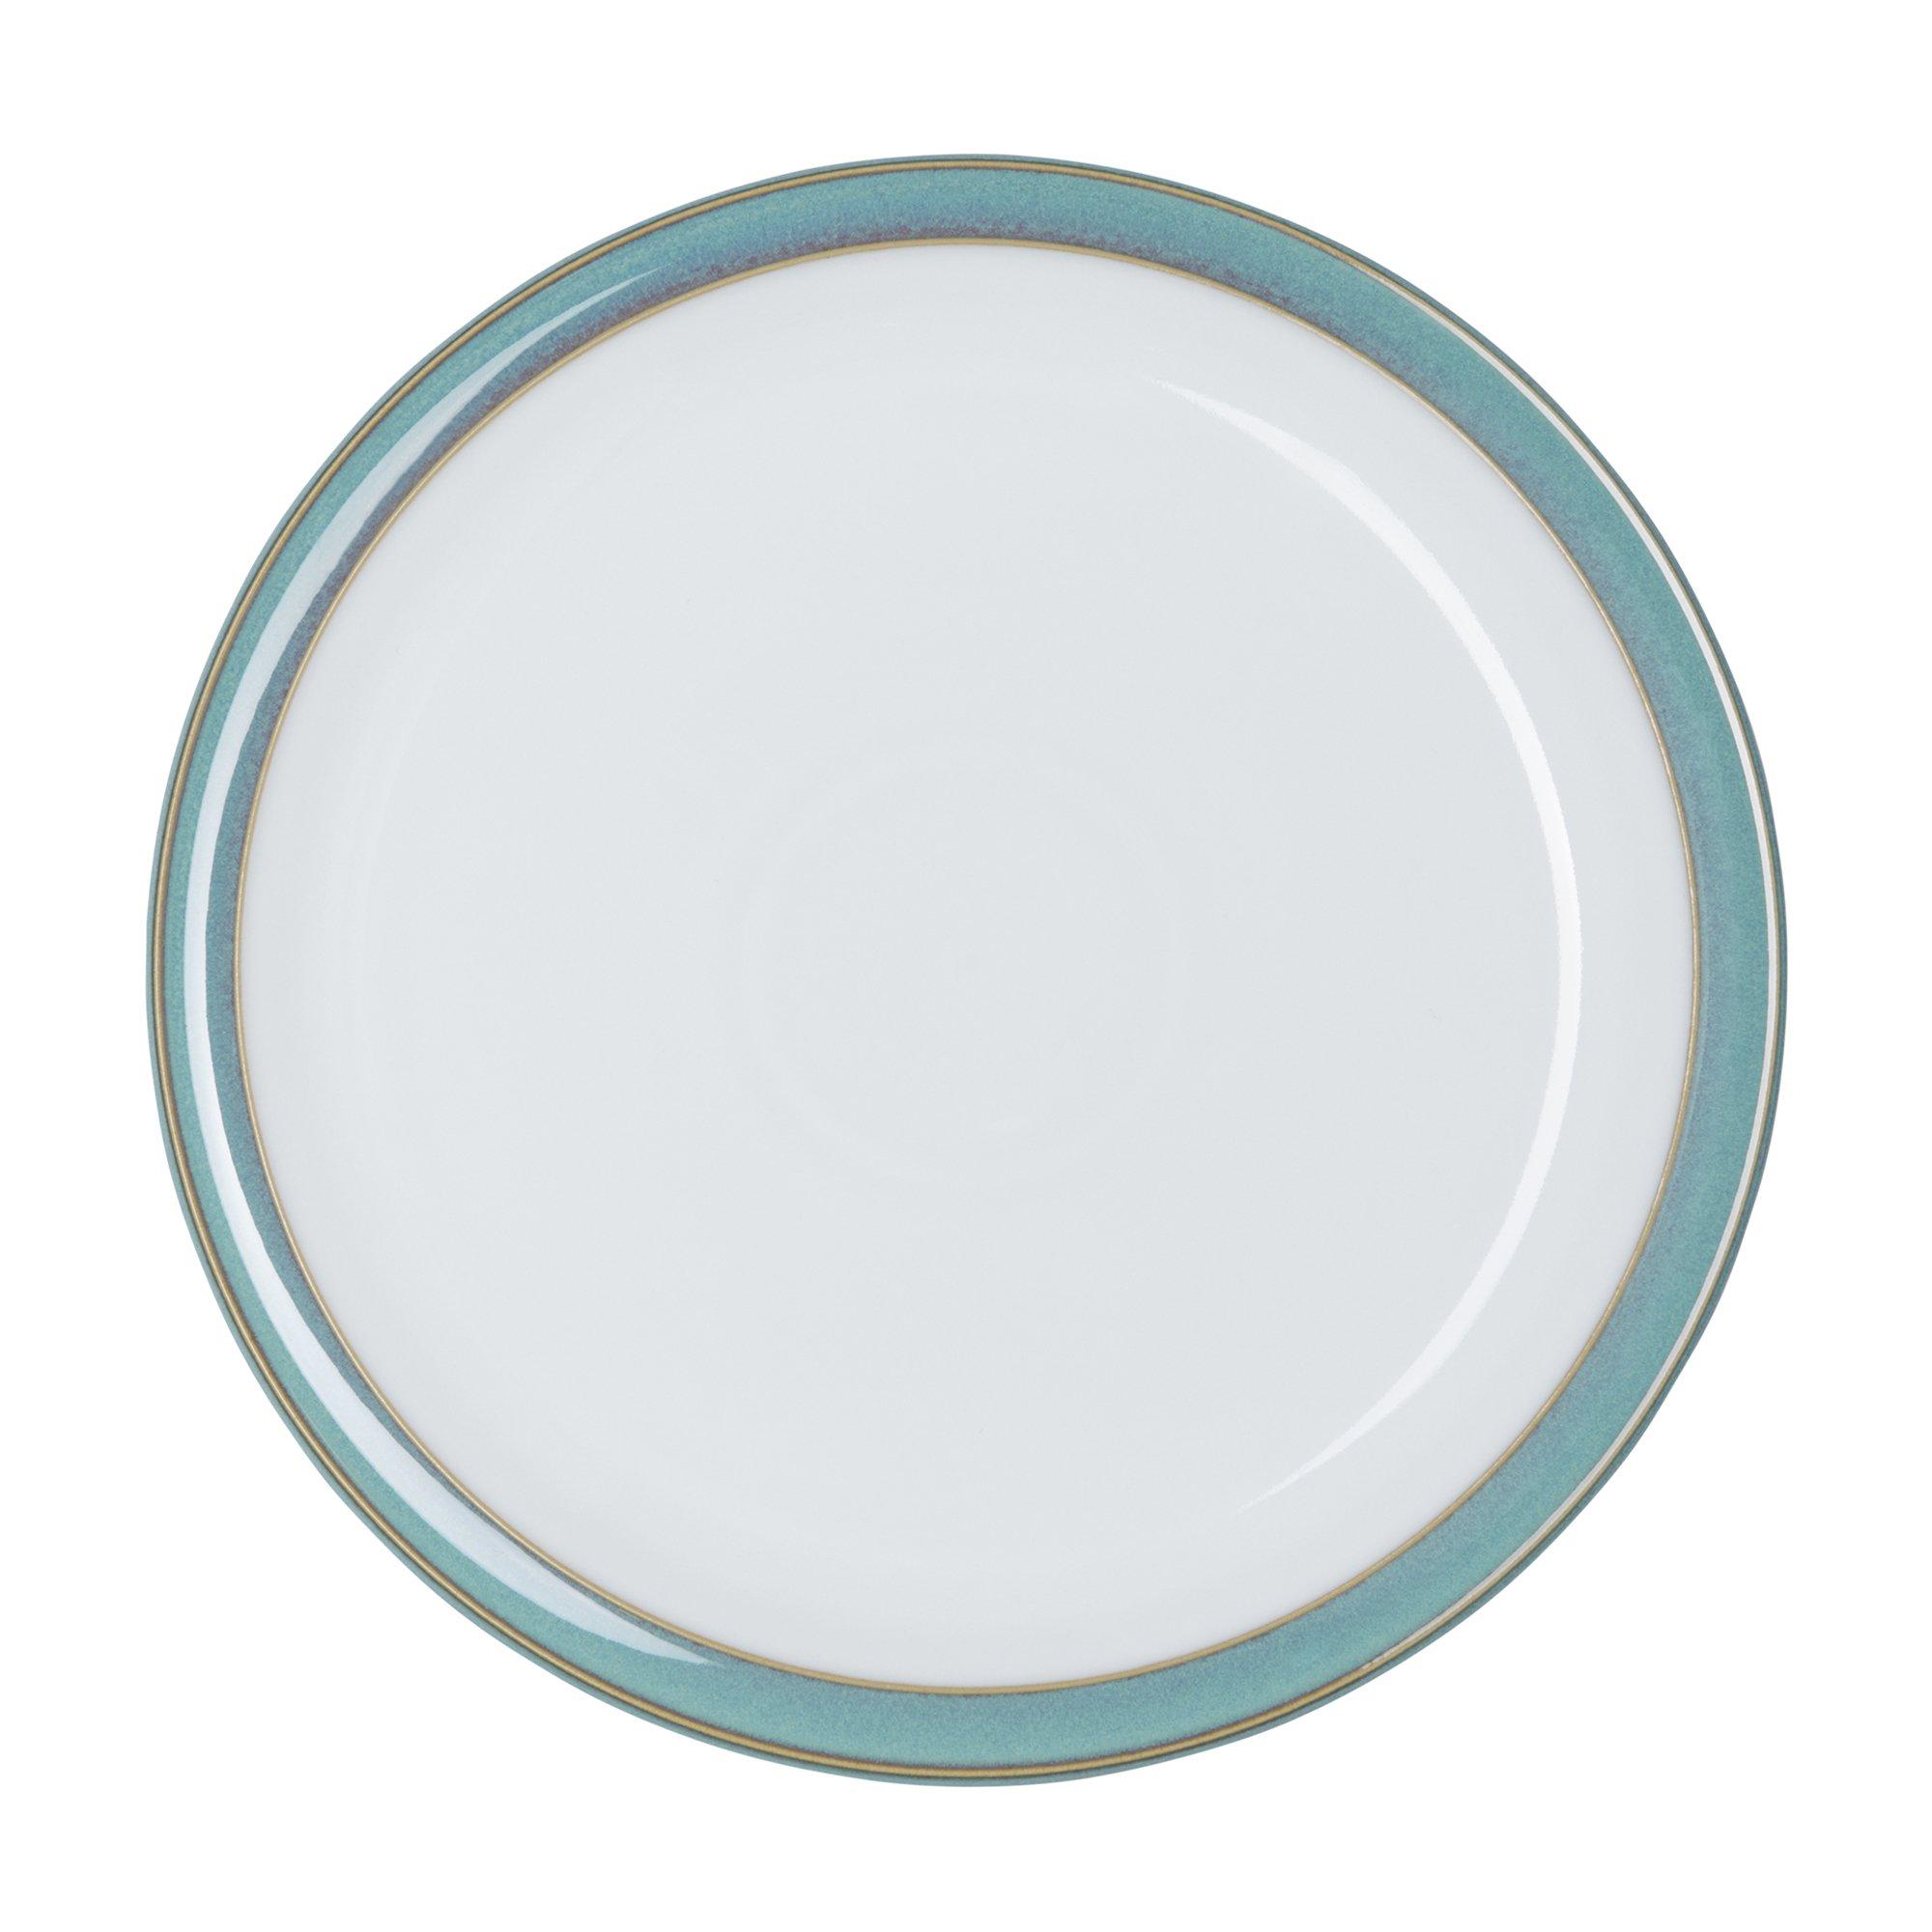 Denby Azure Dinner Plates, Set of 4